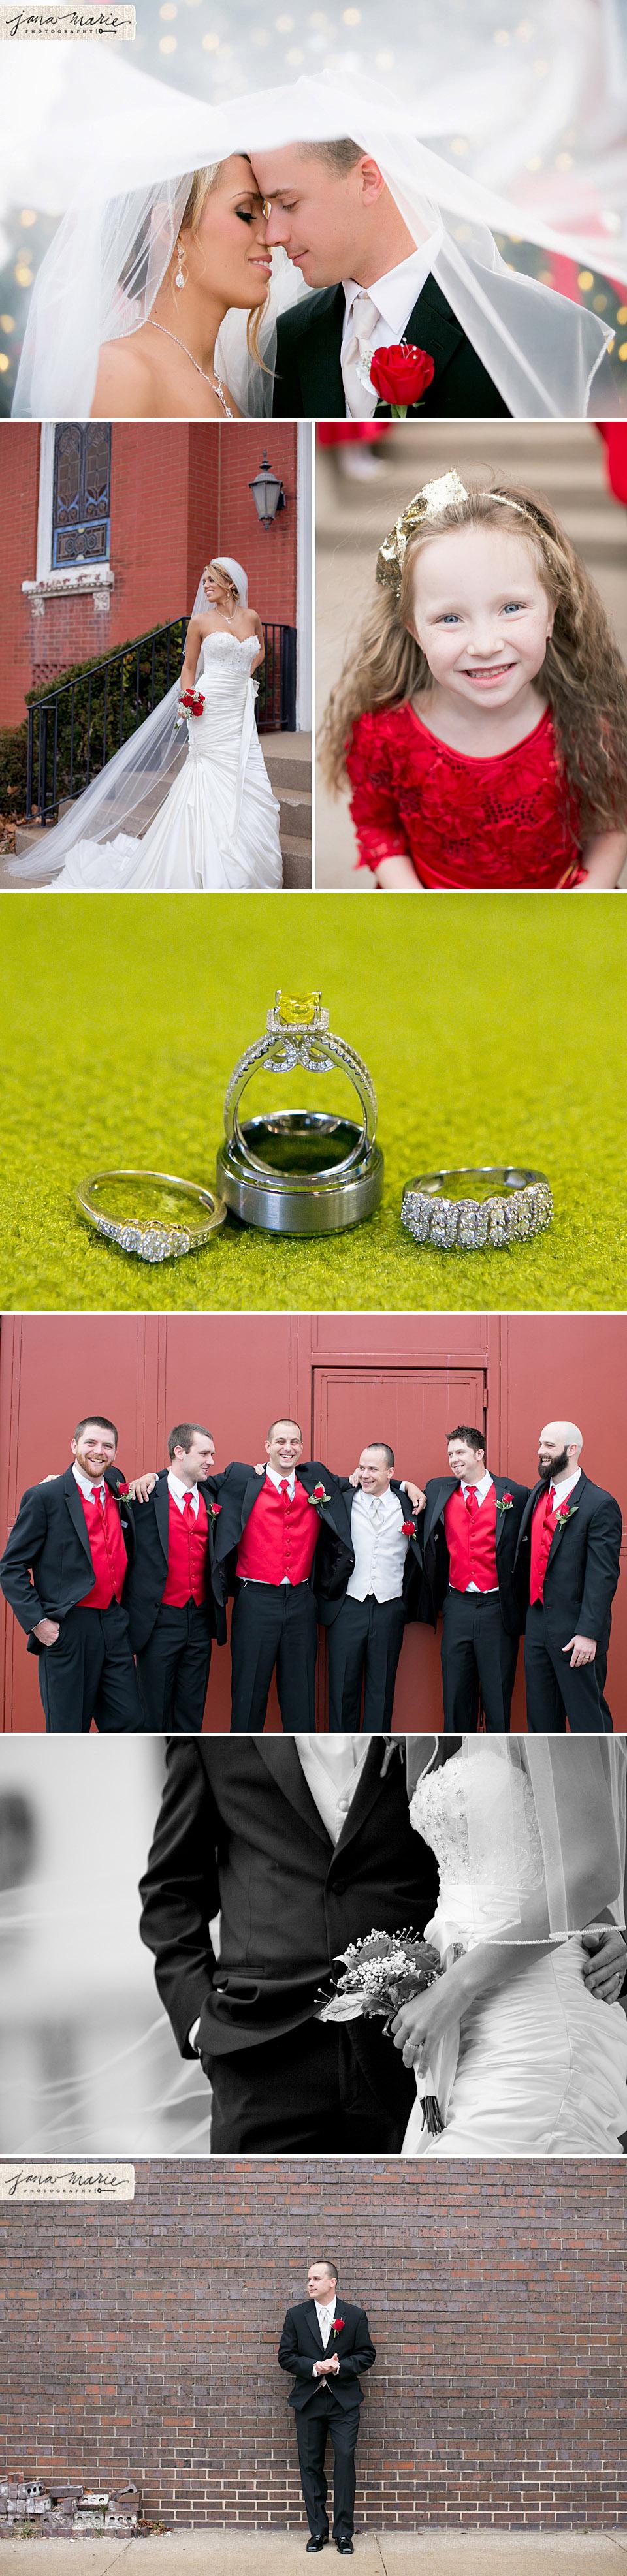 Christmas weddings, Jana Marie Photography, KC wedding, Independence Missouri, Ring shots